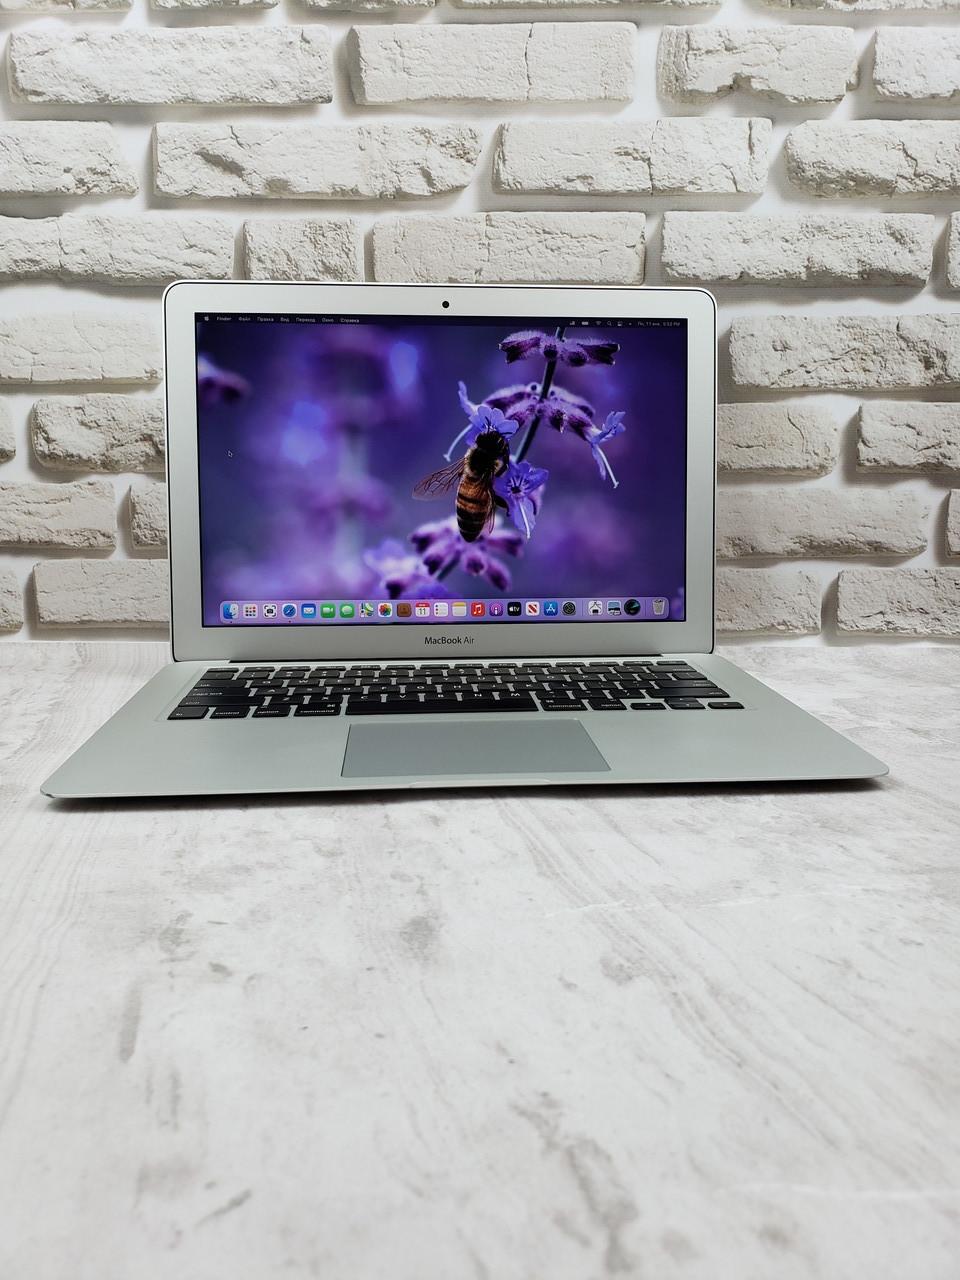 MacBook Air 13,3'' Mid 2017 i5 MQD32 8Gb 256Gb SSD  Магазин Гарантия